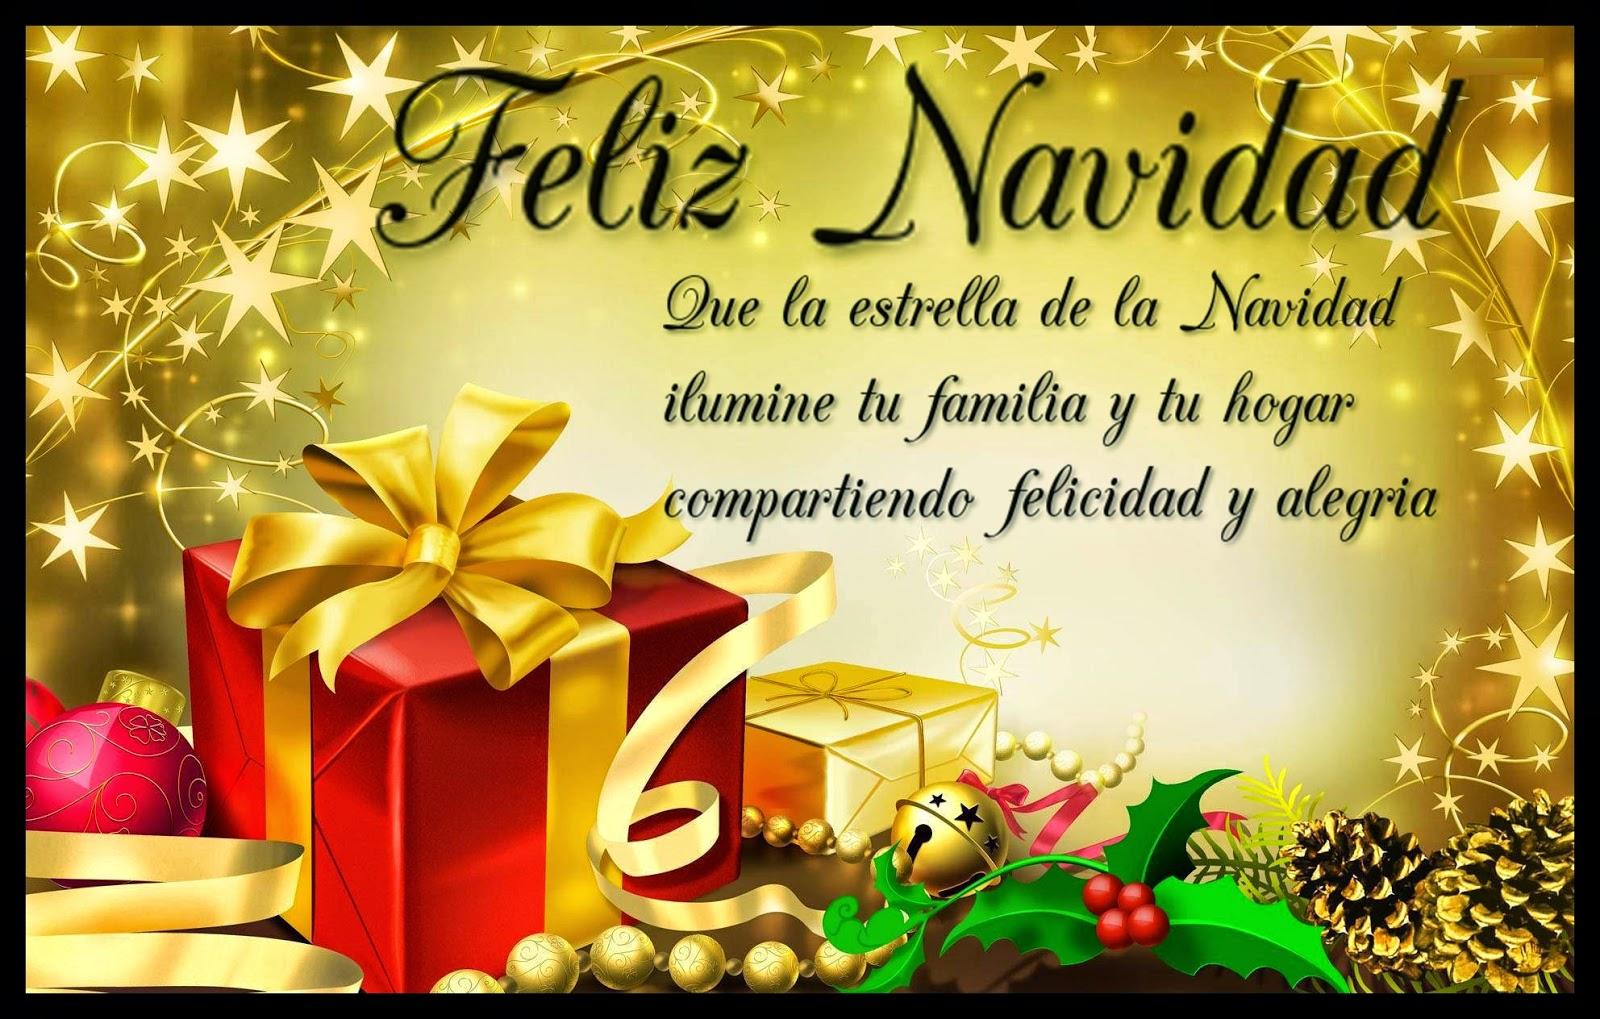 Tarjetas de navidad gratis tarjetas de amor - Tarjetas de navidad manuales ...